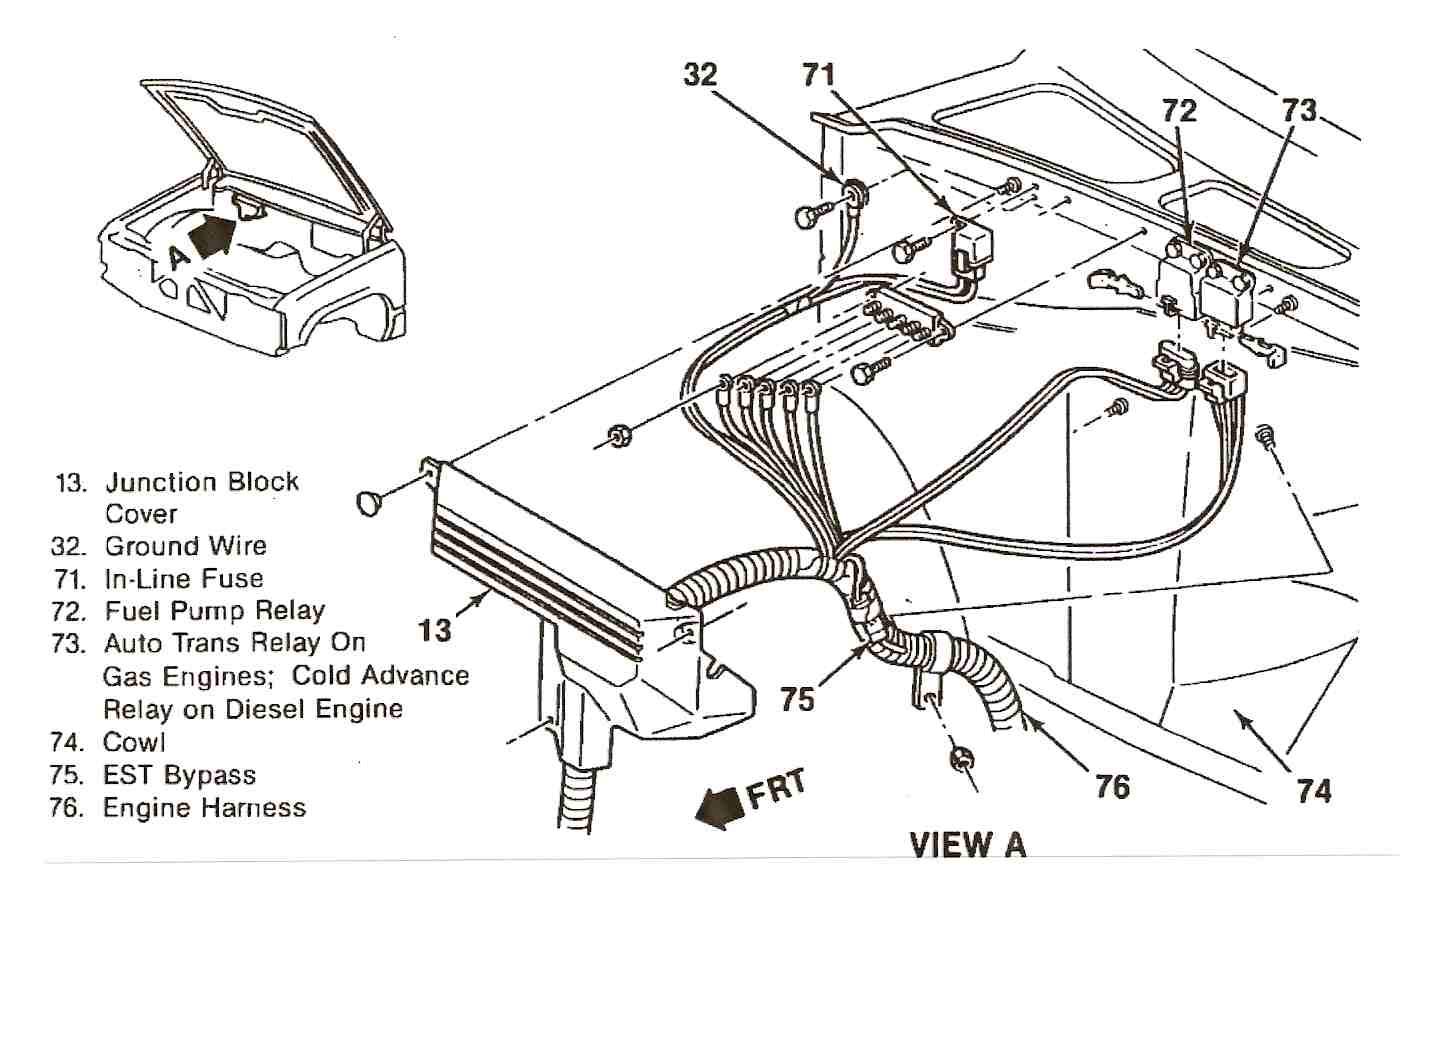 87 Chevy V10 Wiring Diagram